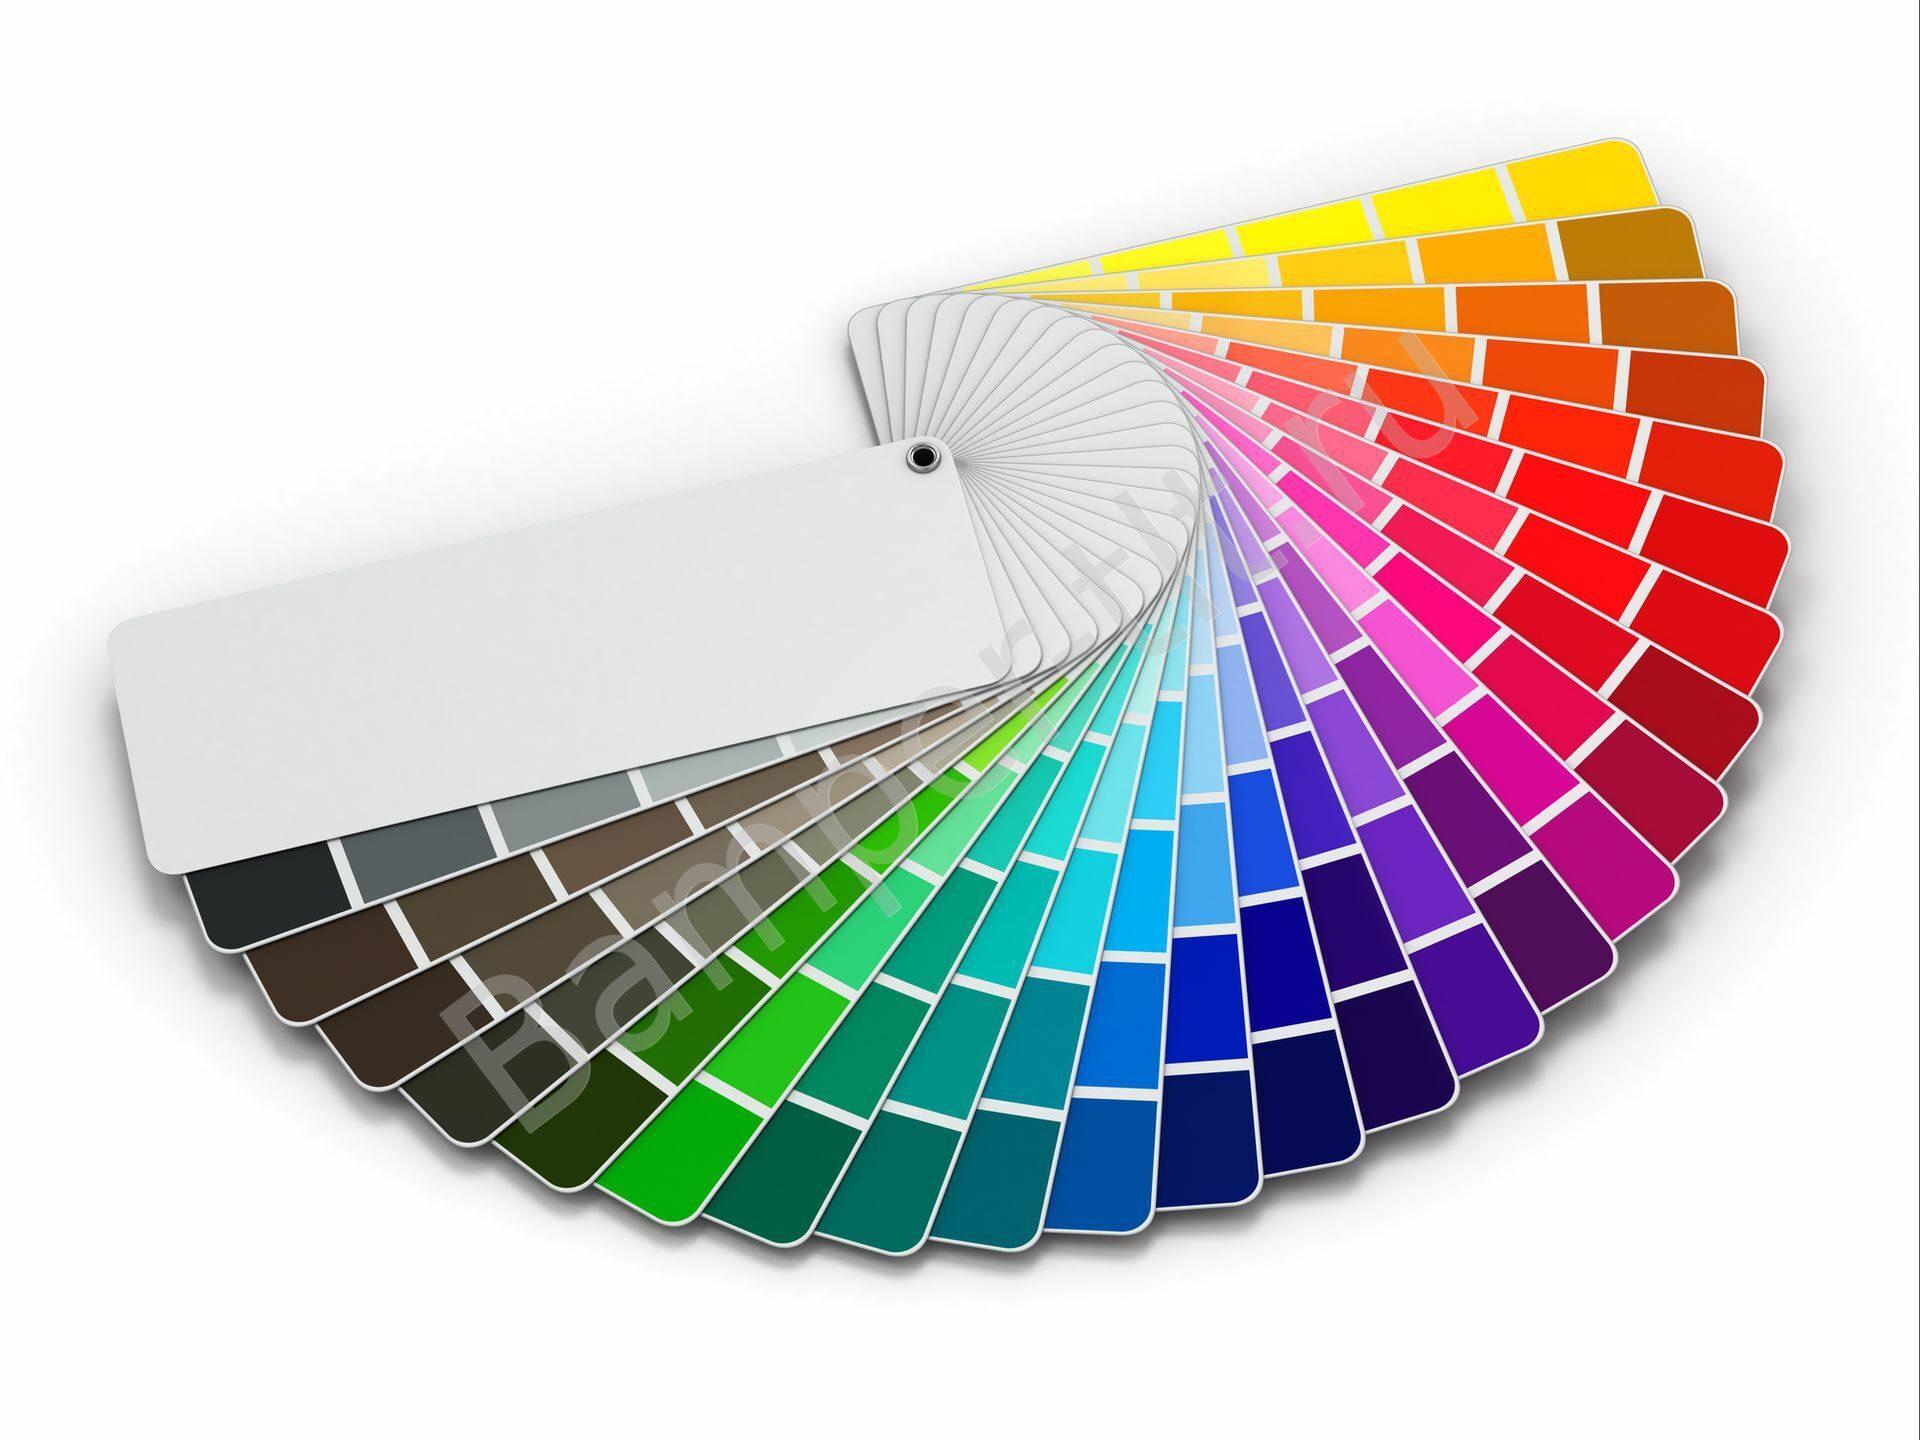 мышцы палетка краски для стен фото картинки для